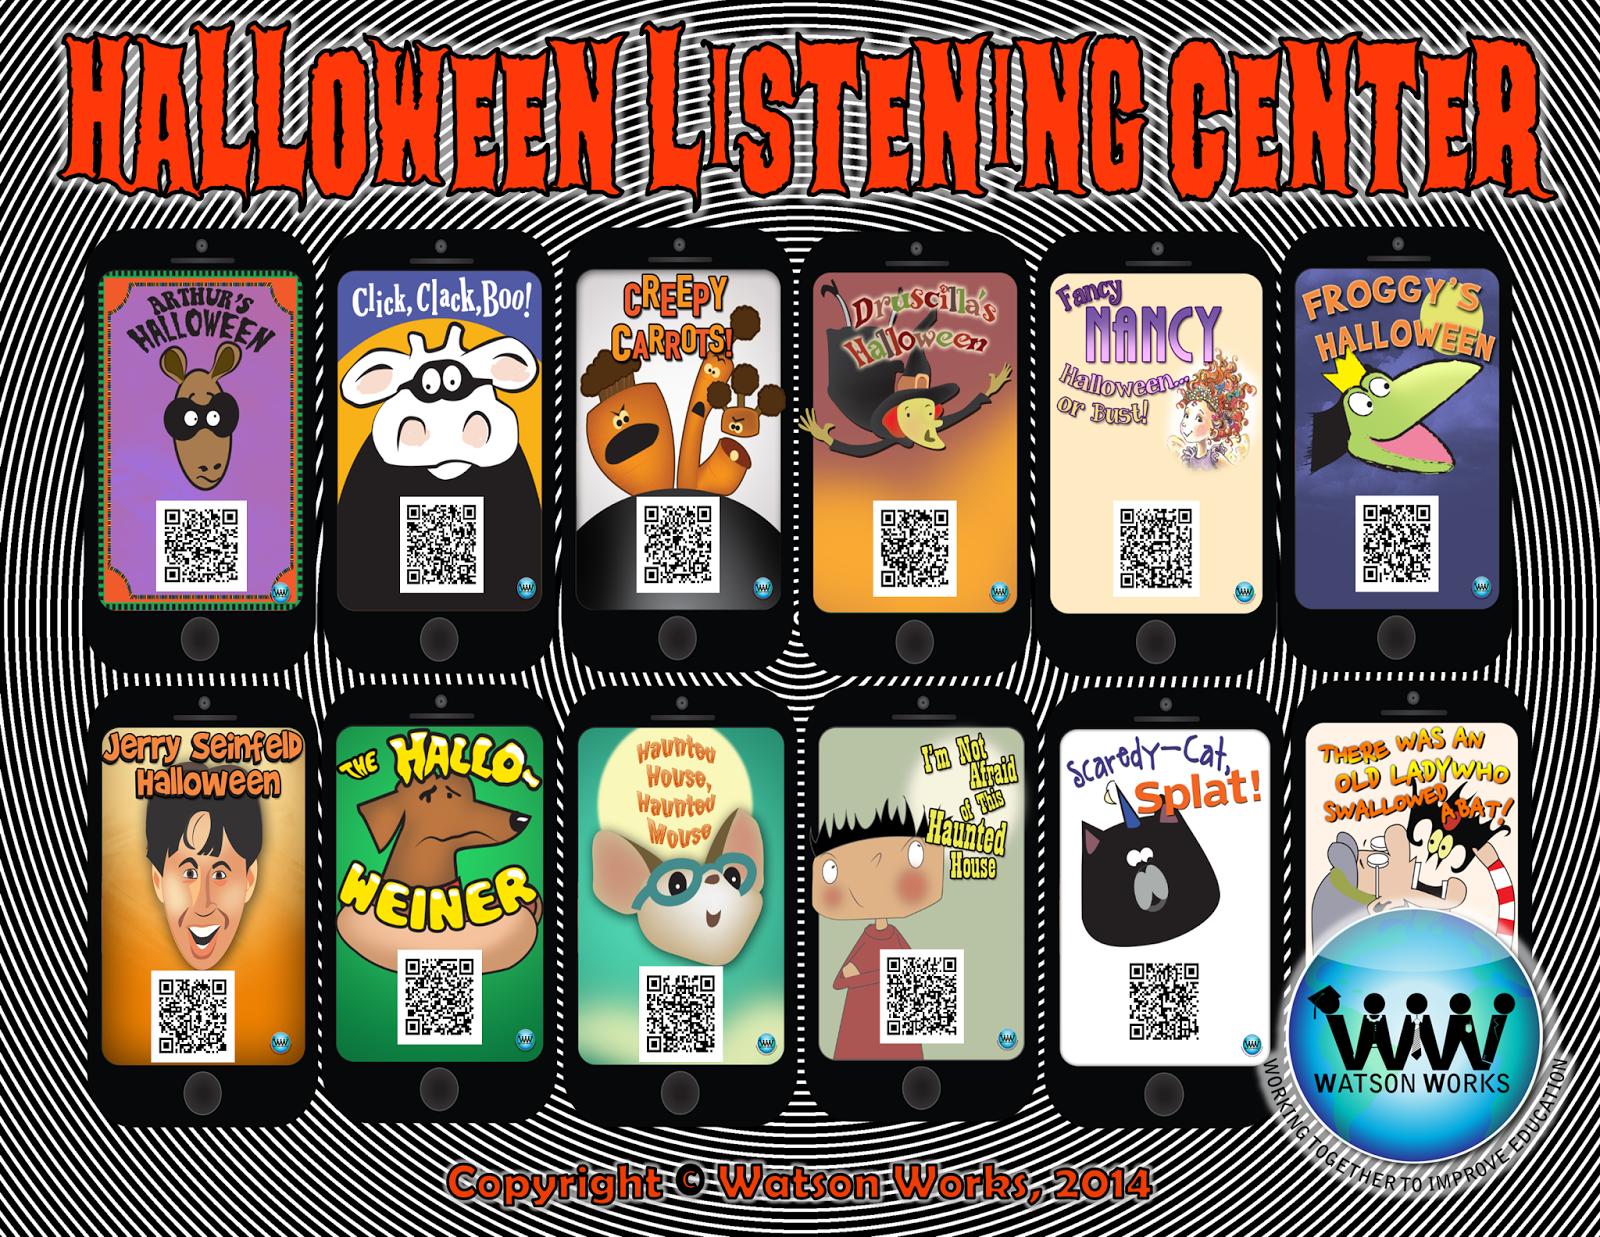 http://www.teacherspayteachers.com/Product/Halloween-Listening-Centers-w-QR-Codes-Hyperlinks-12-Stories-Included-1479338